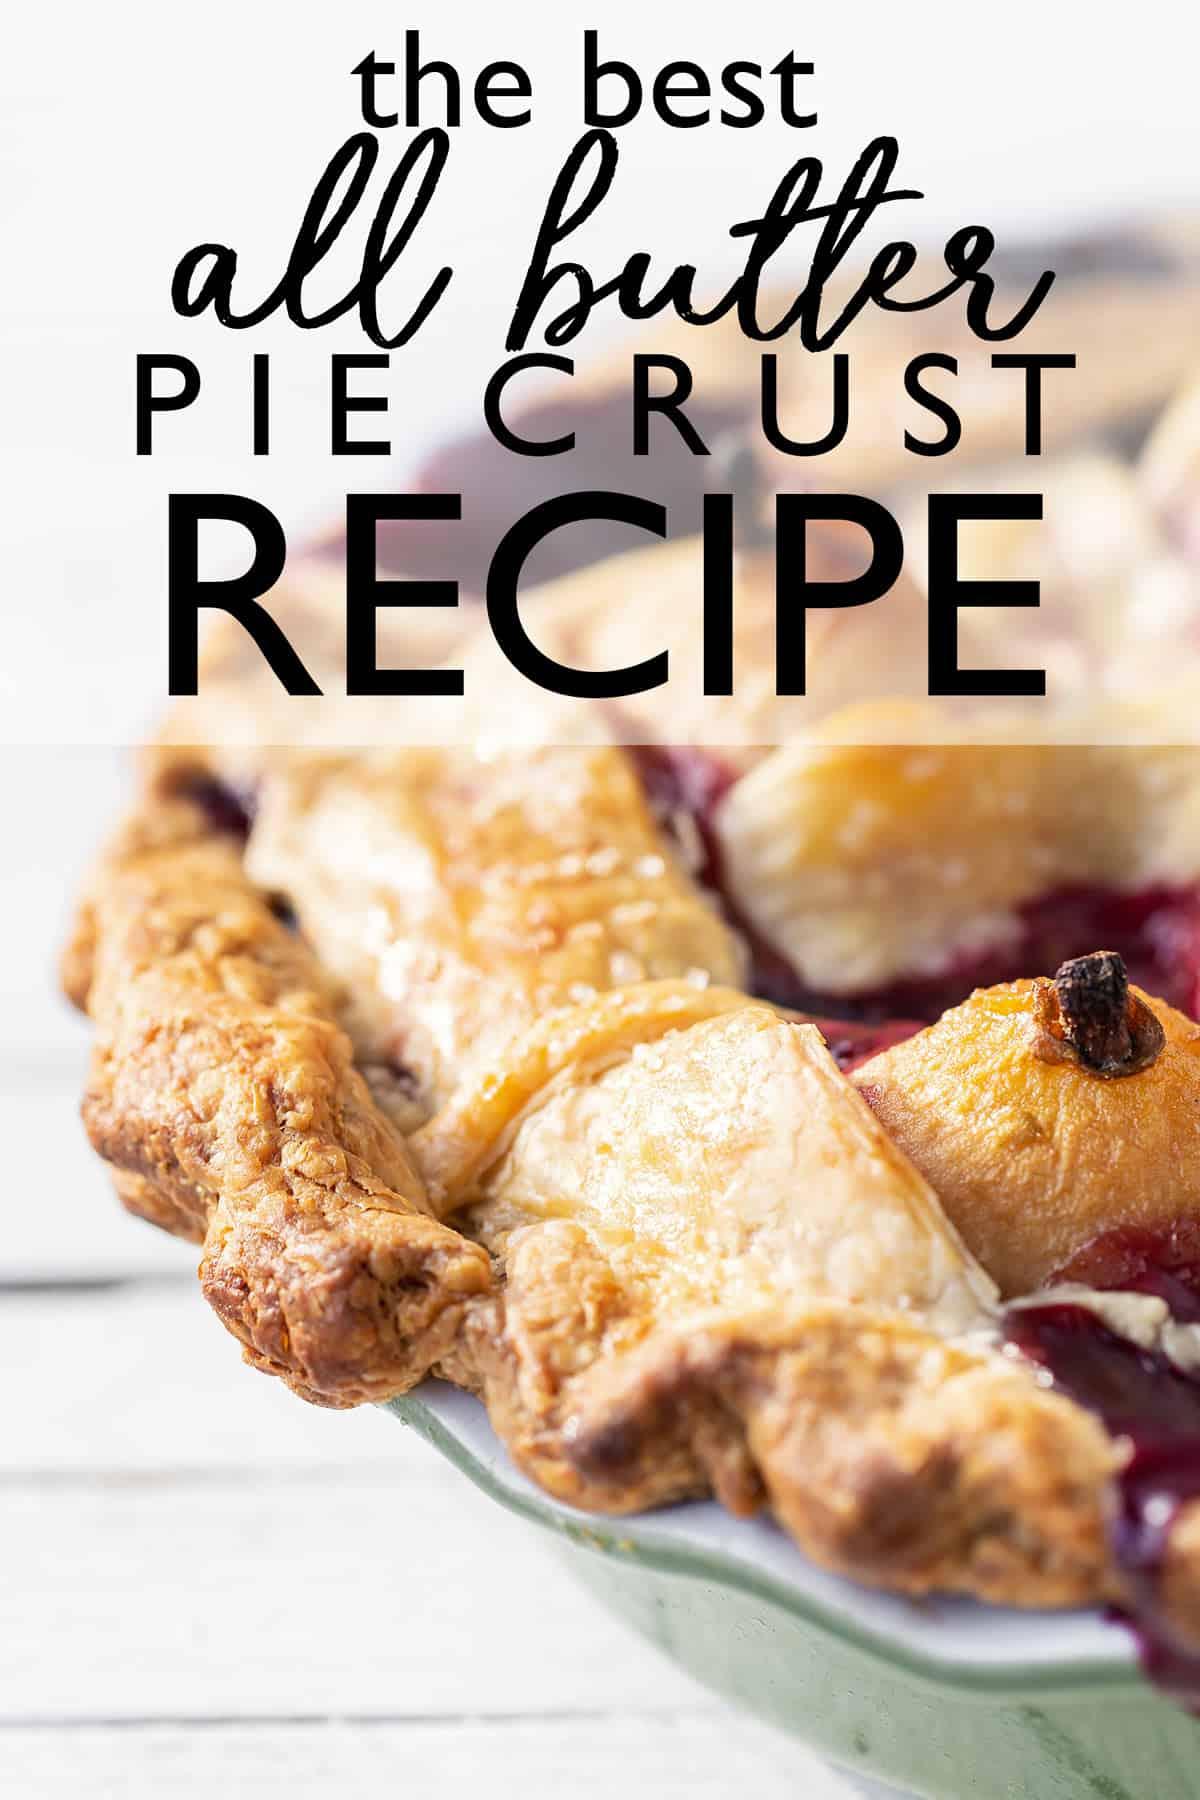 Easy homemade pie crust recipe. The BEST all butter pie crust recipe made without special equipment. Classic pie crust recipe!